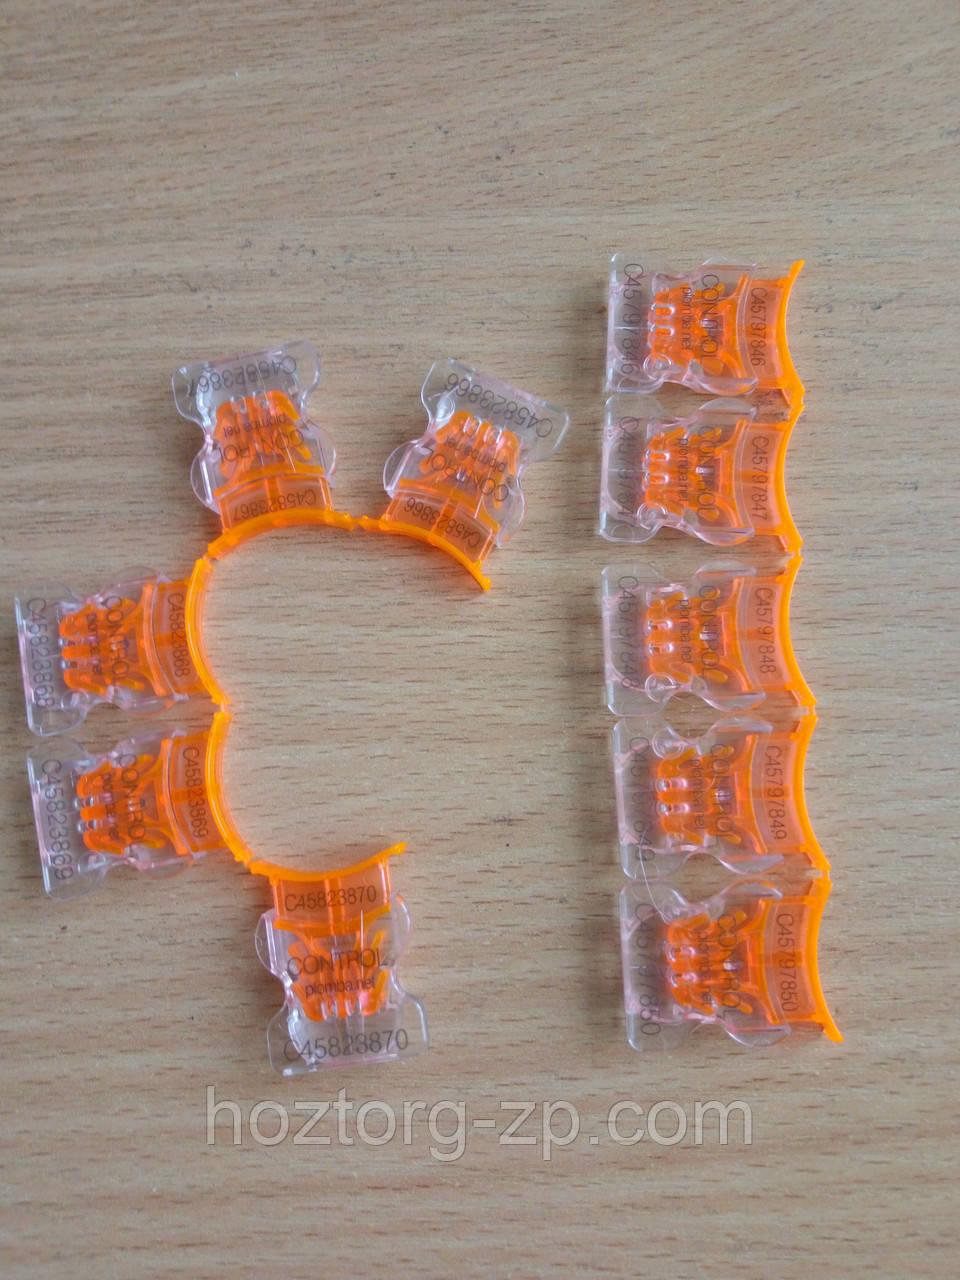 Пломба пластиковая номерная защёлка